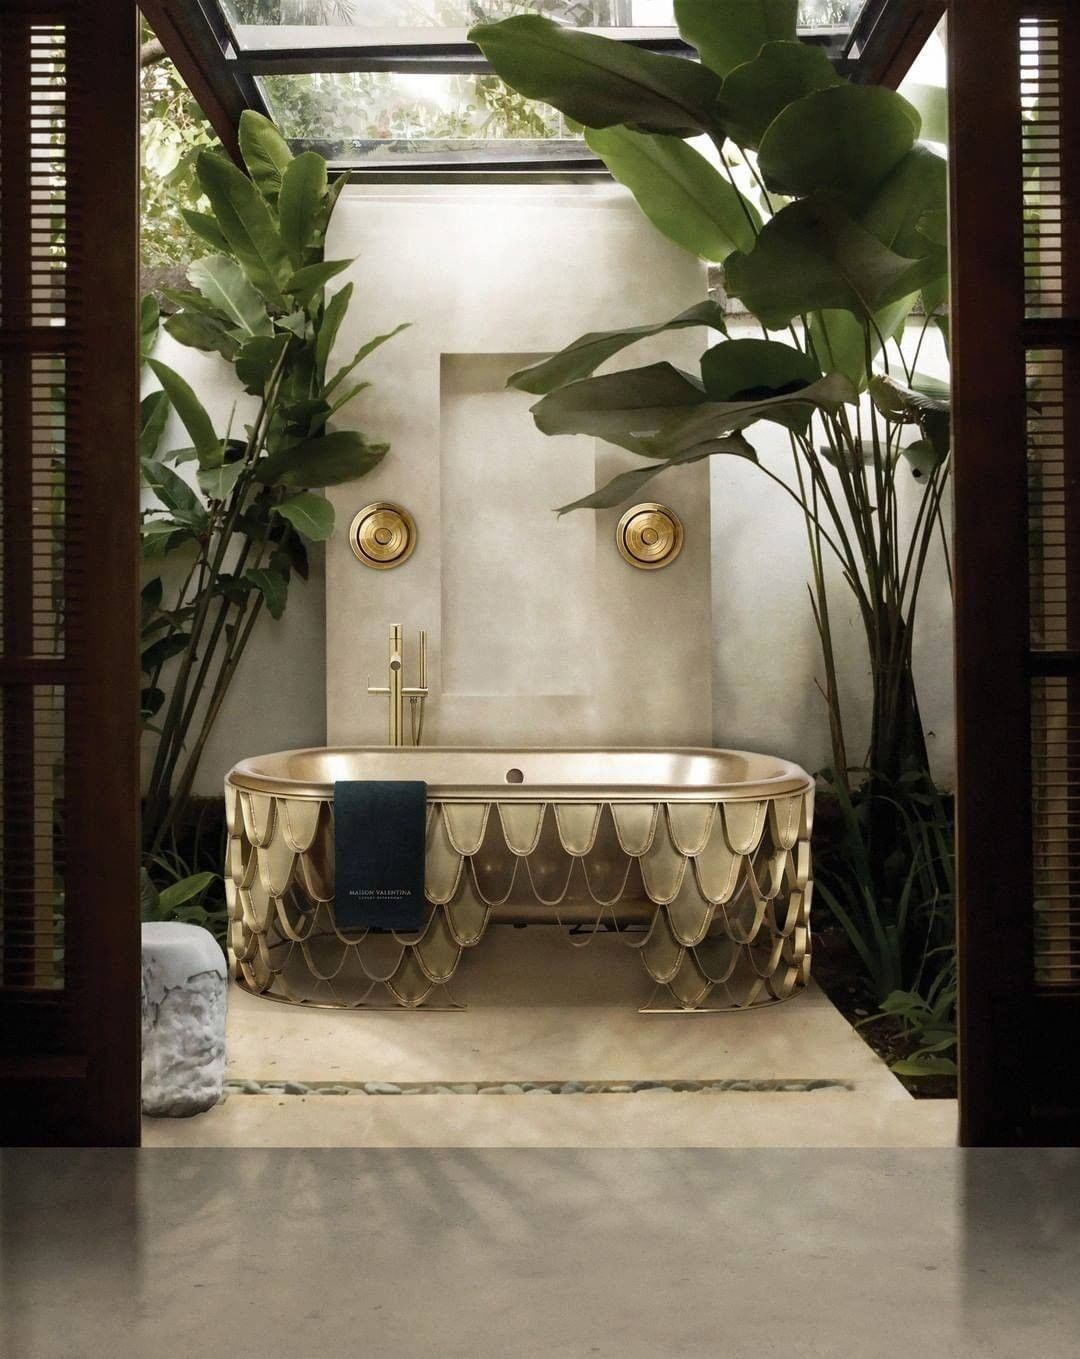 MODERN REPRESENTATION OF BATHROOM LIGHTNING DESIGN